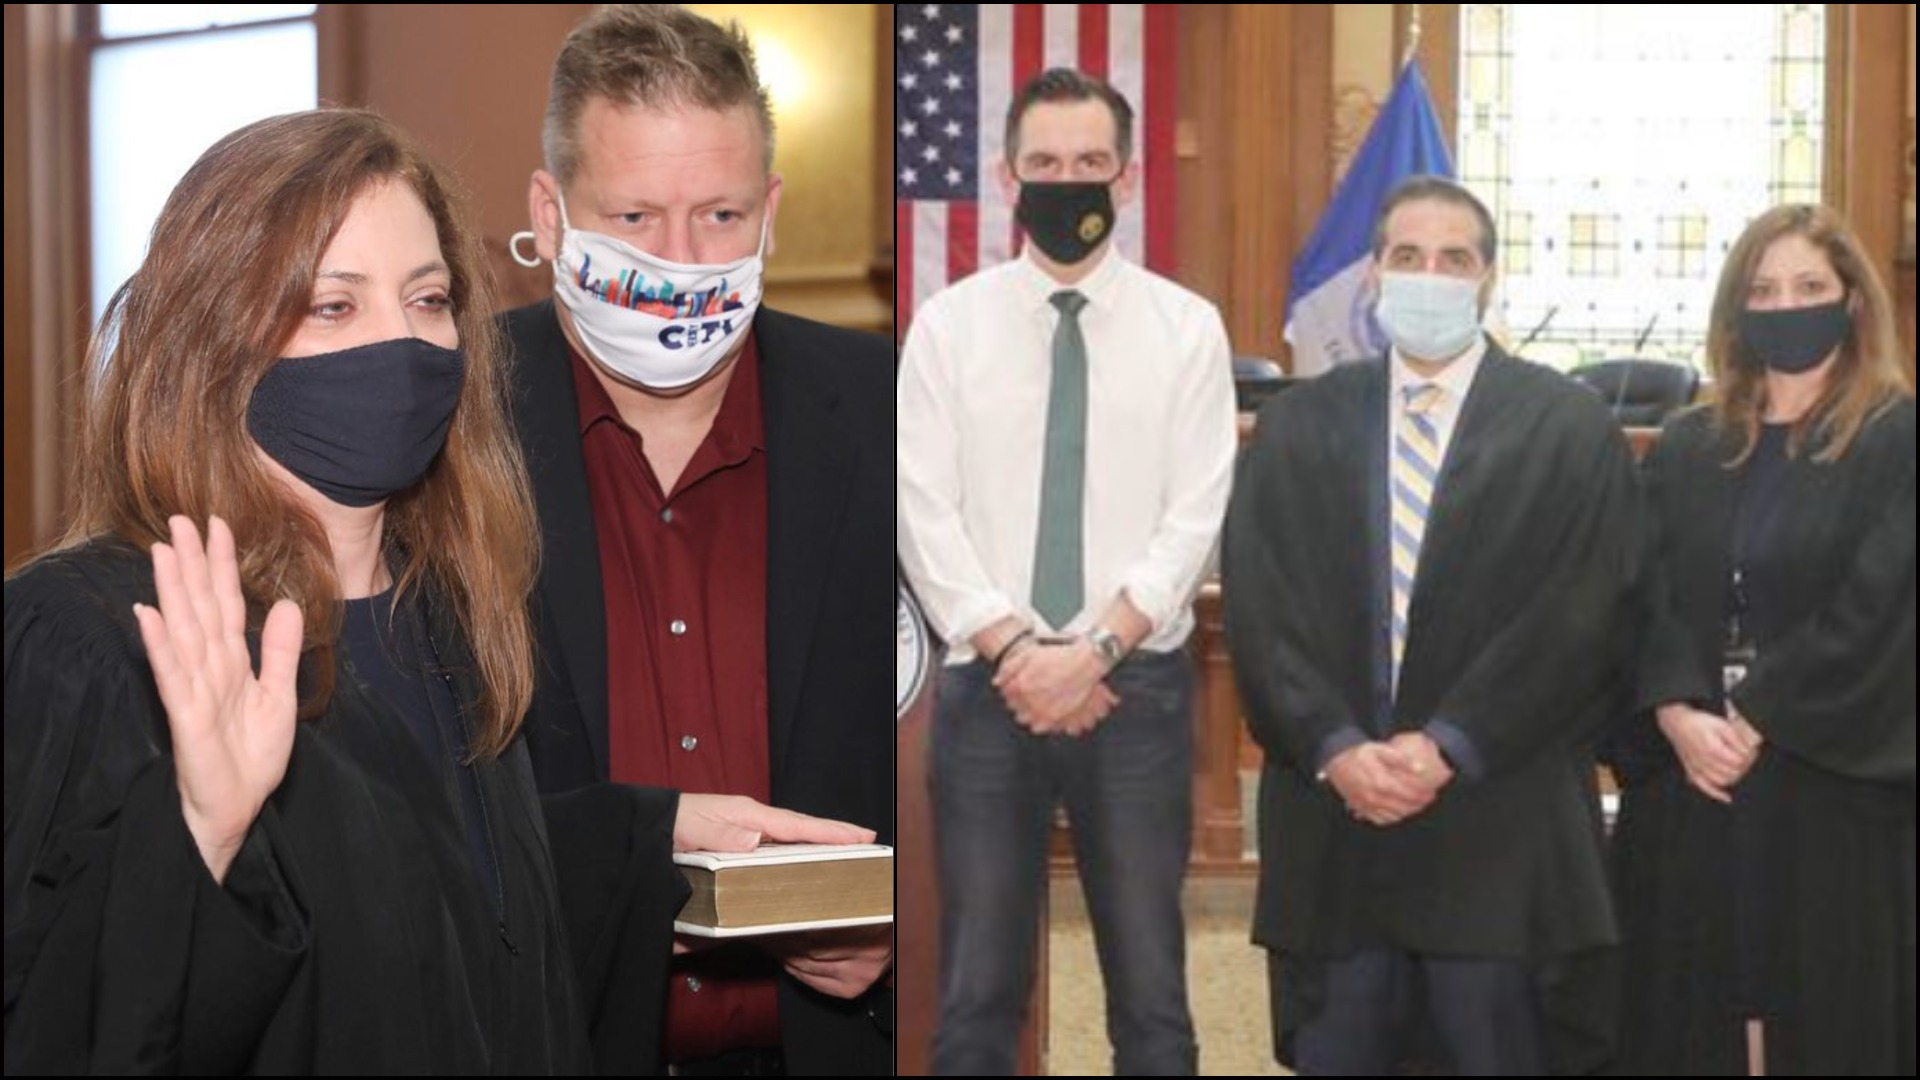 Judge Karen DeSoto - Joseph Olszewski - Mayor Steven Fulop - Judge Ramy Eid - Jersey City